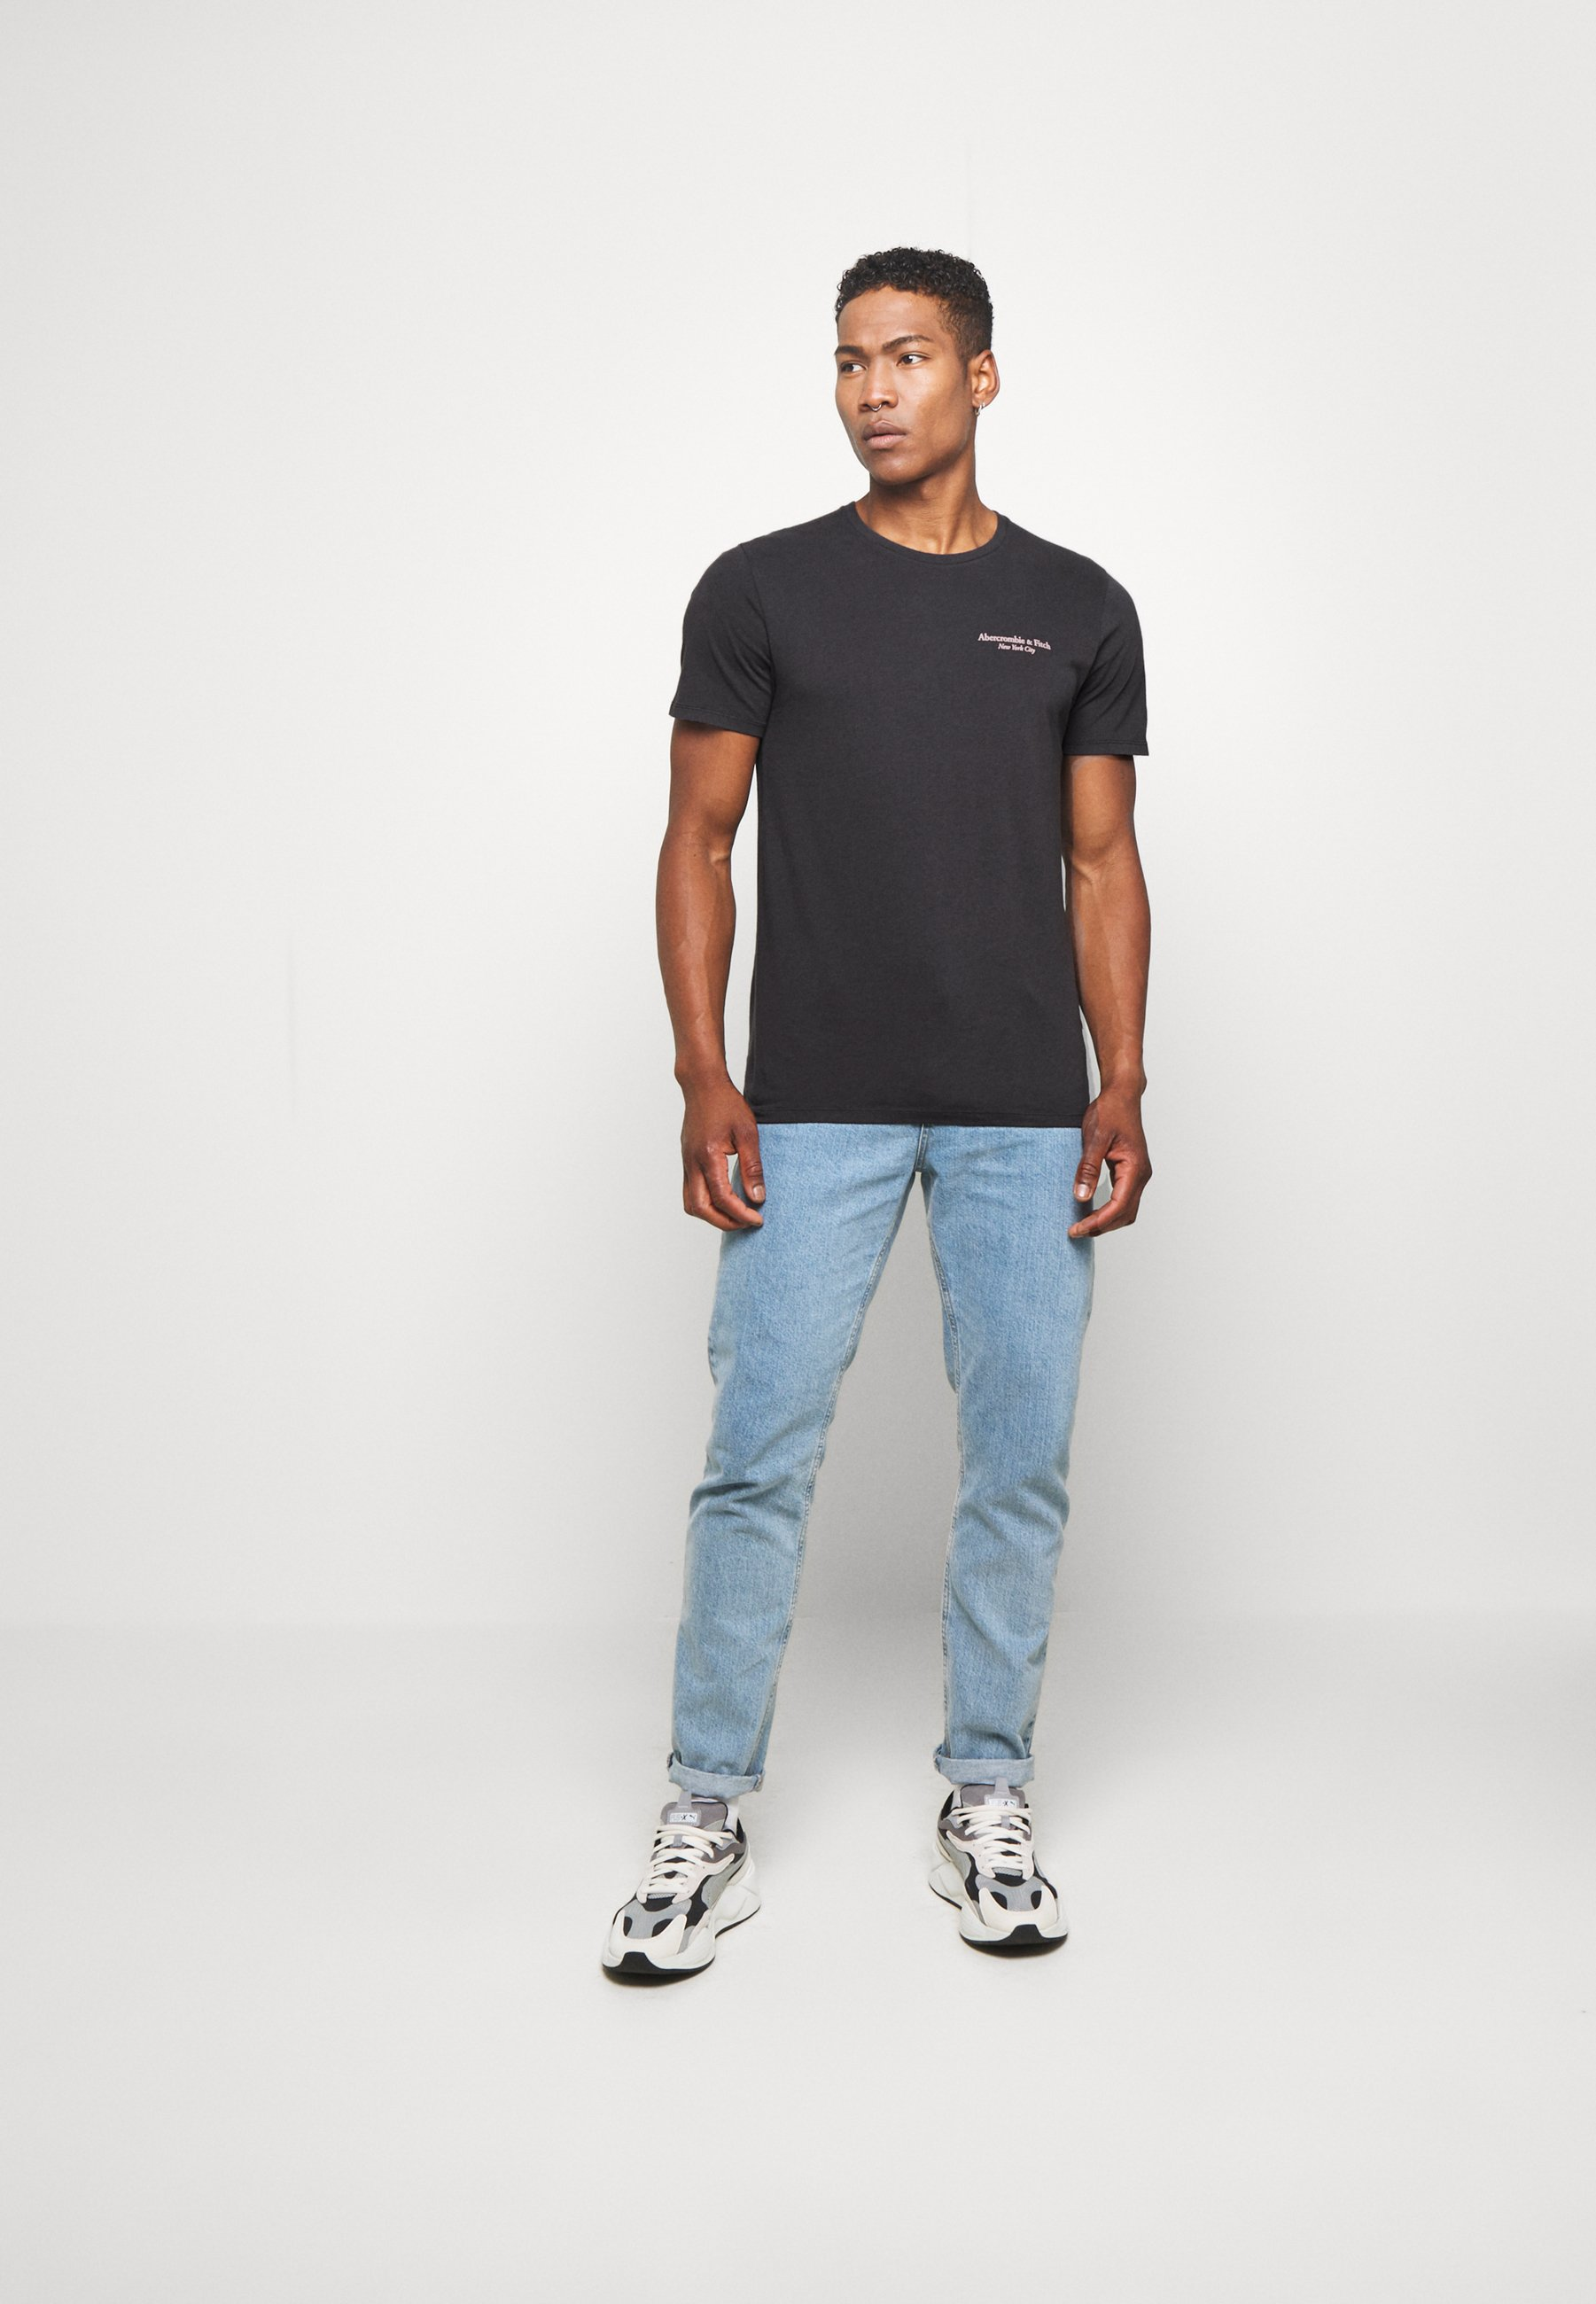 Abercrombie & Fitch IMAGERY CITY TEE - Camiseta estampada - black w1Jvi